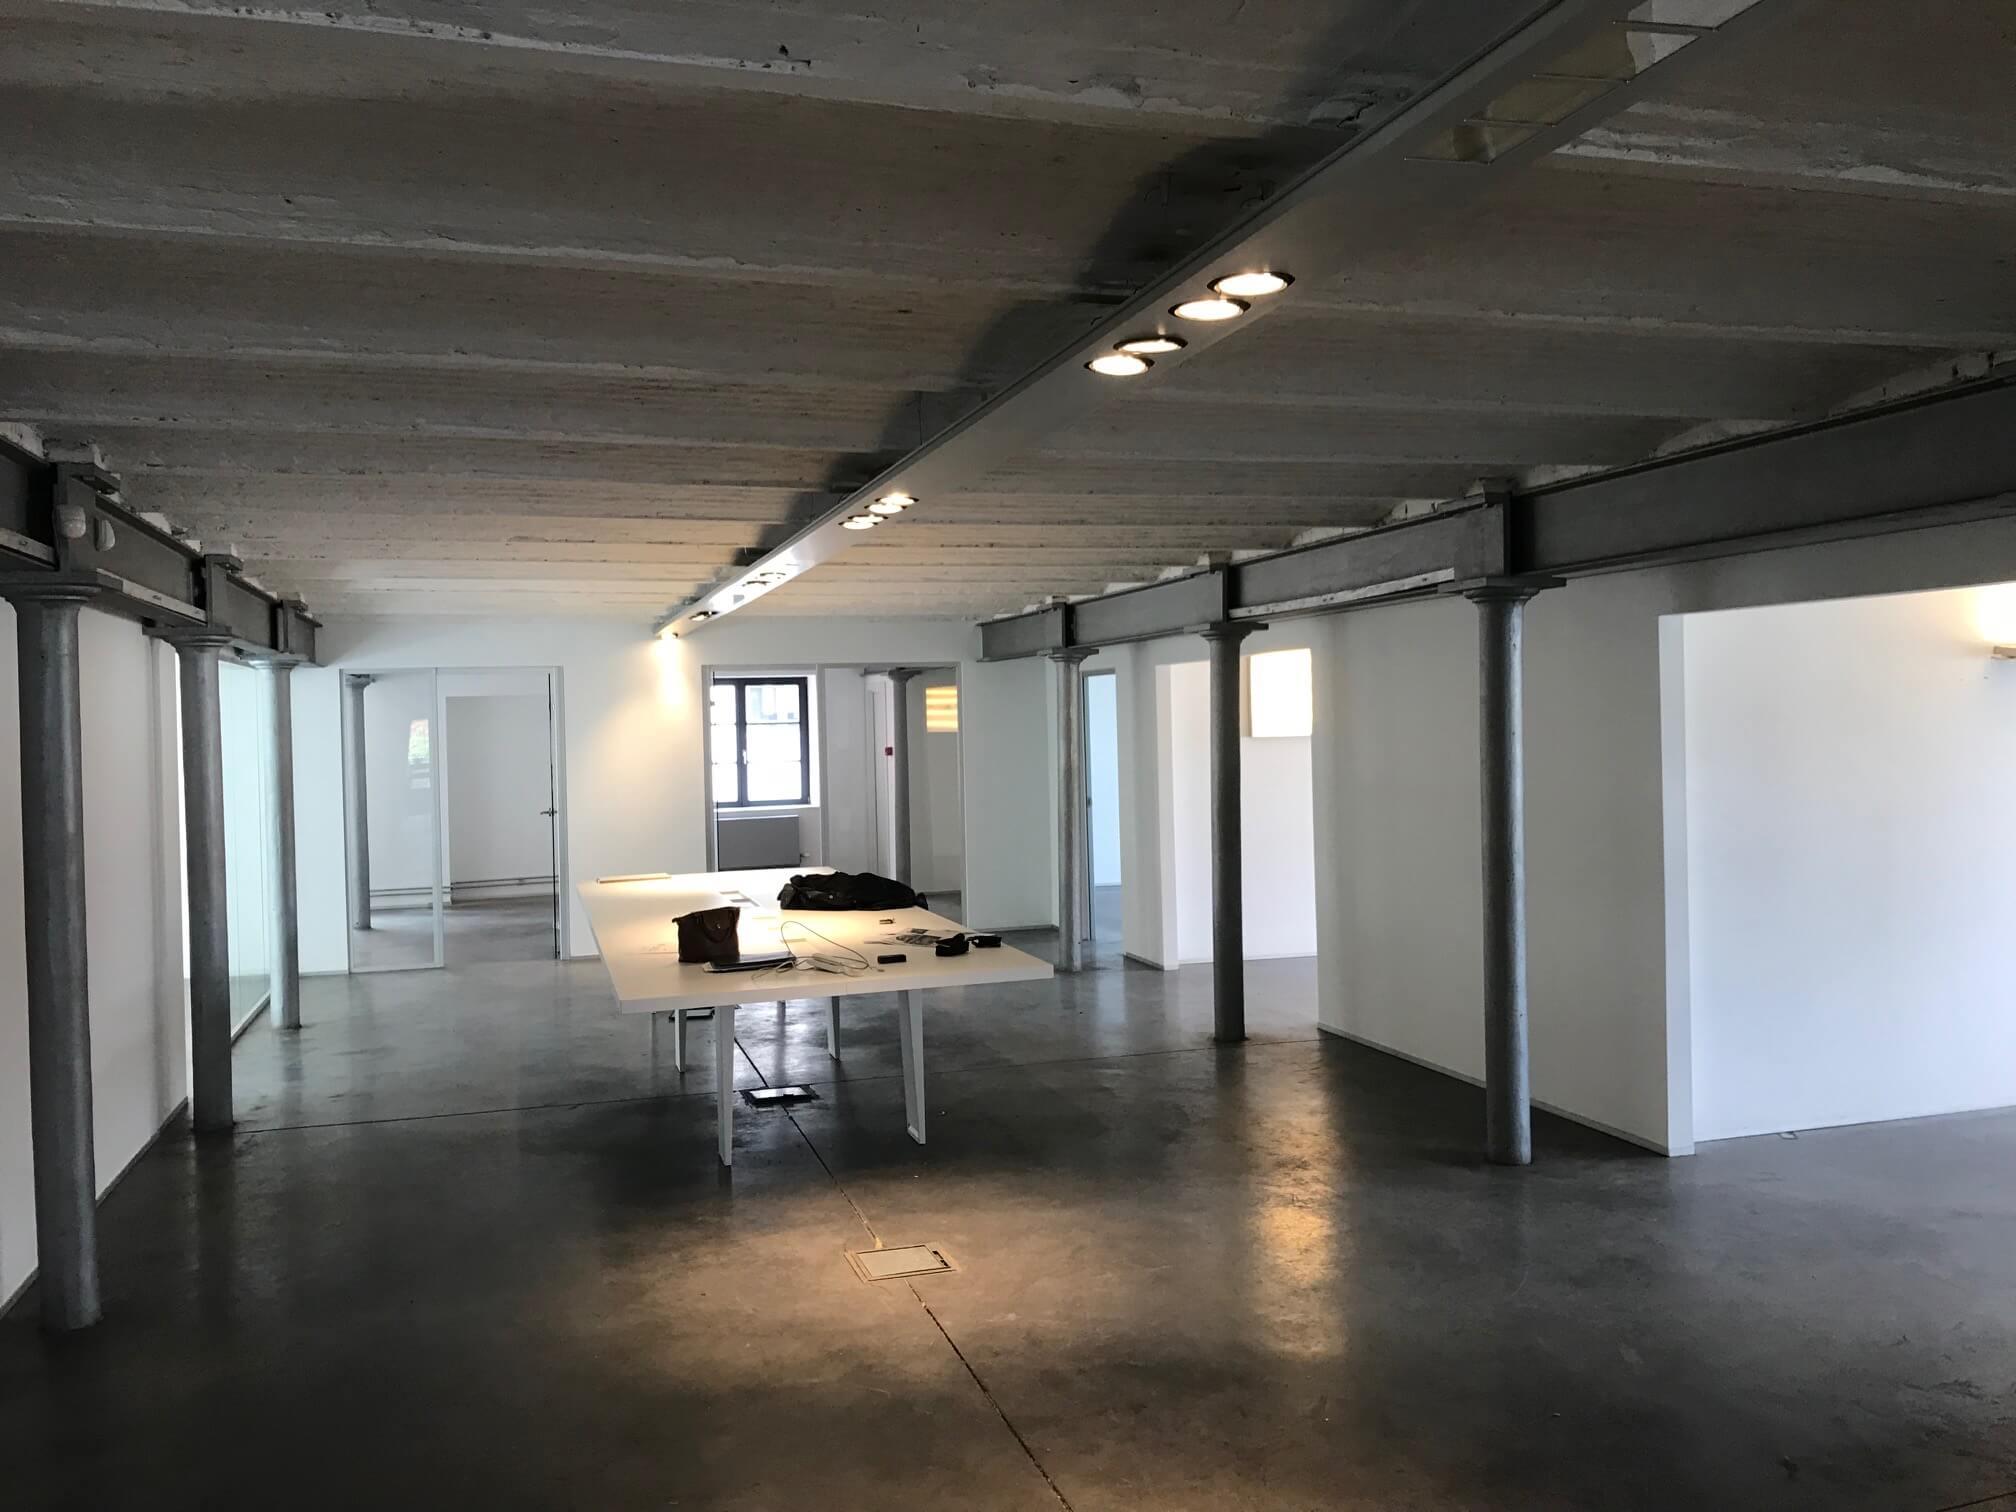 bureau-table-galerie-electricite-vanhoyesprl